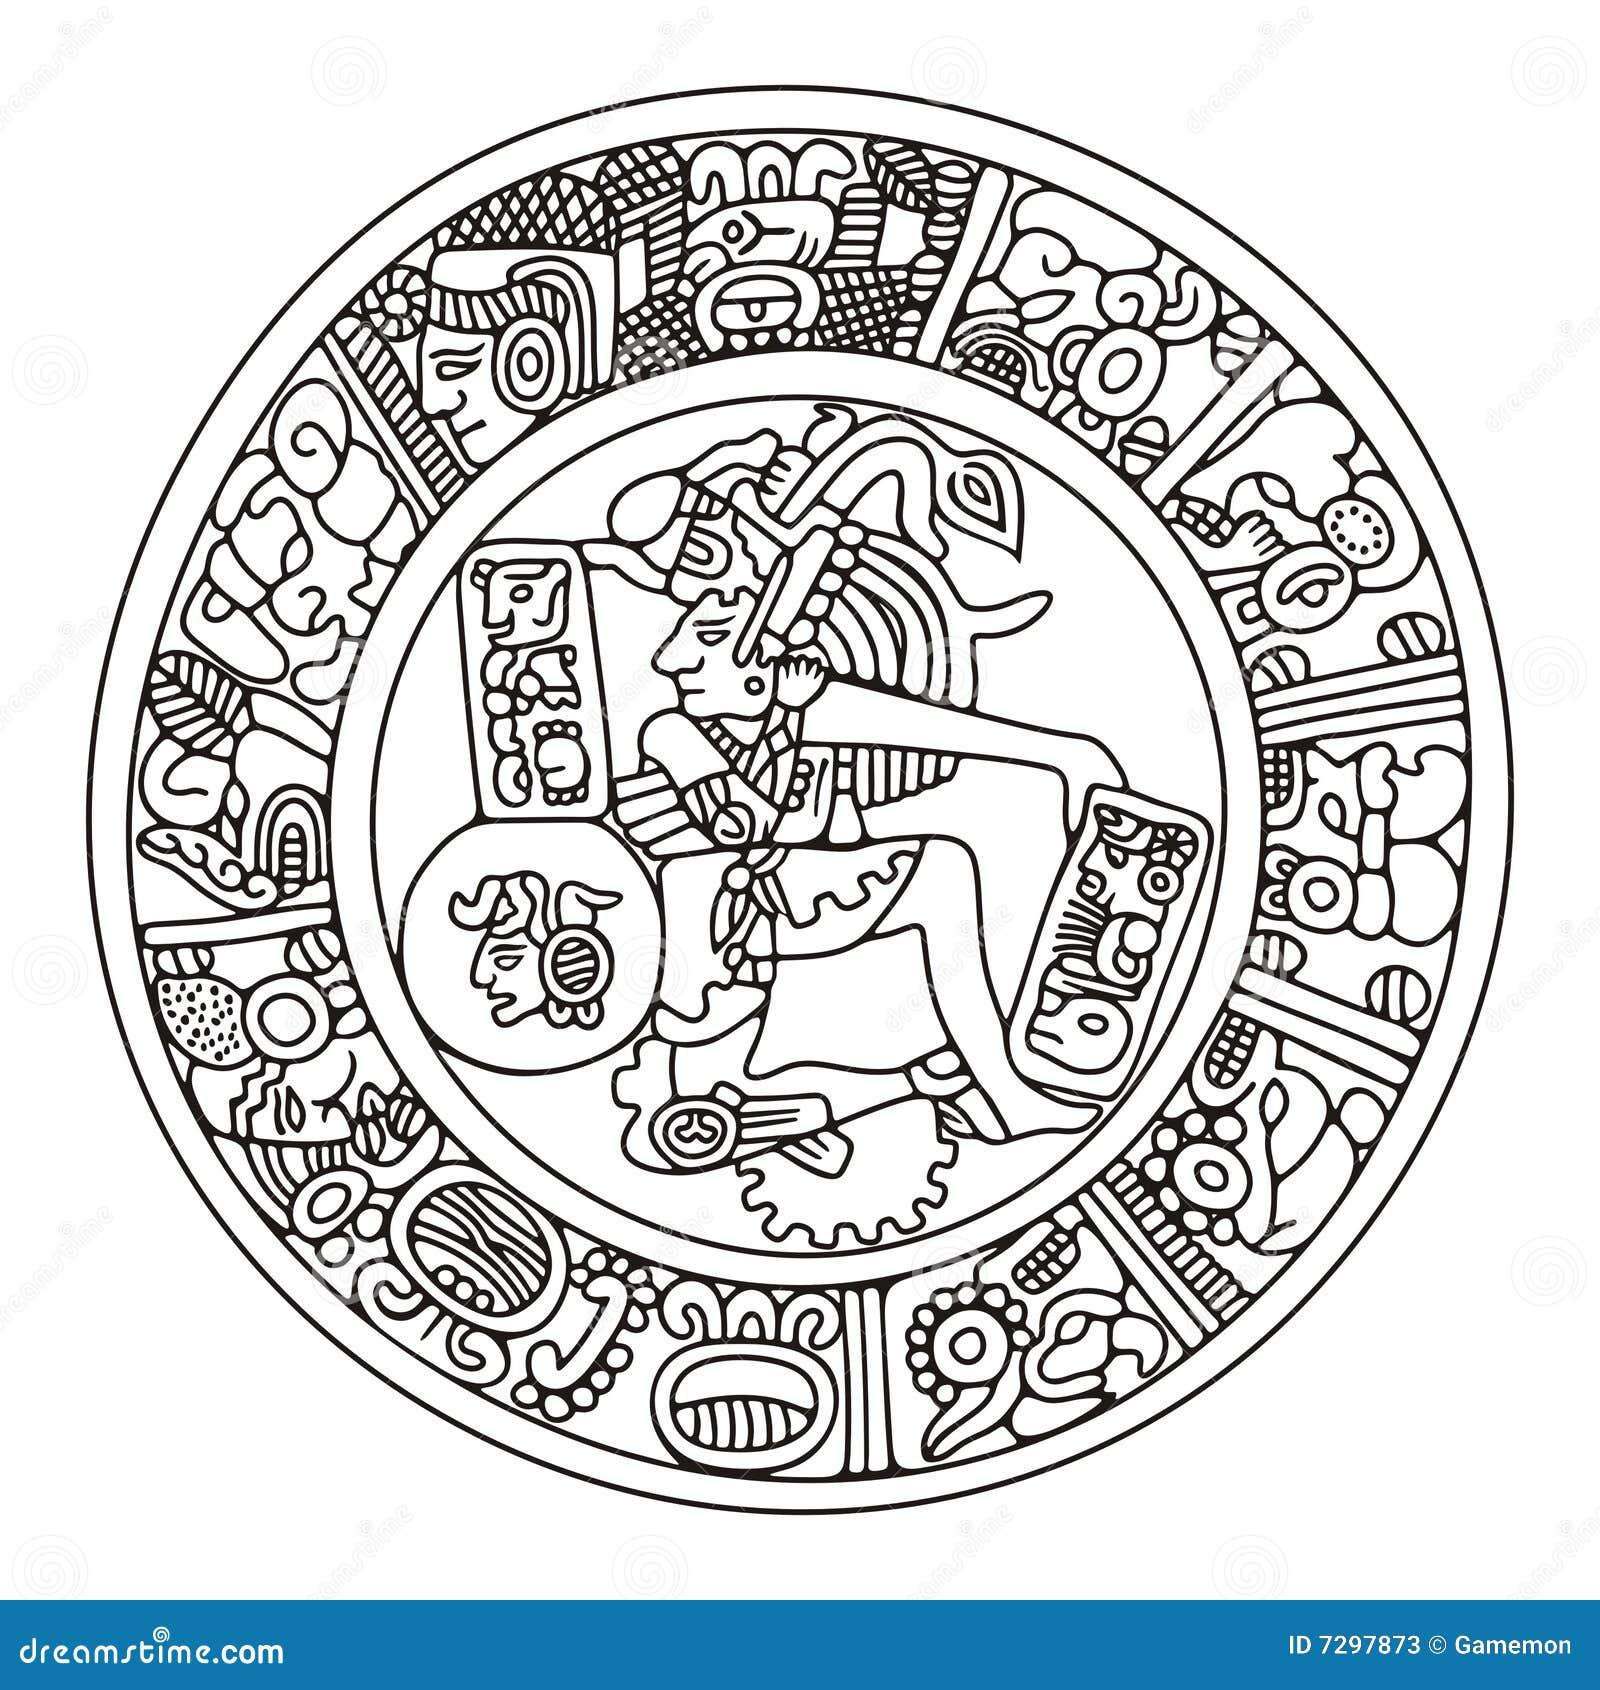 Mayan artwork stock vector. Illustration of mexican